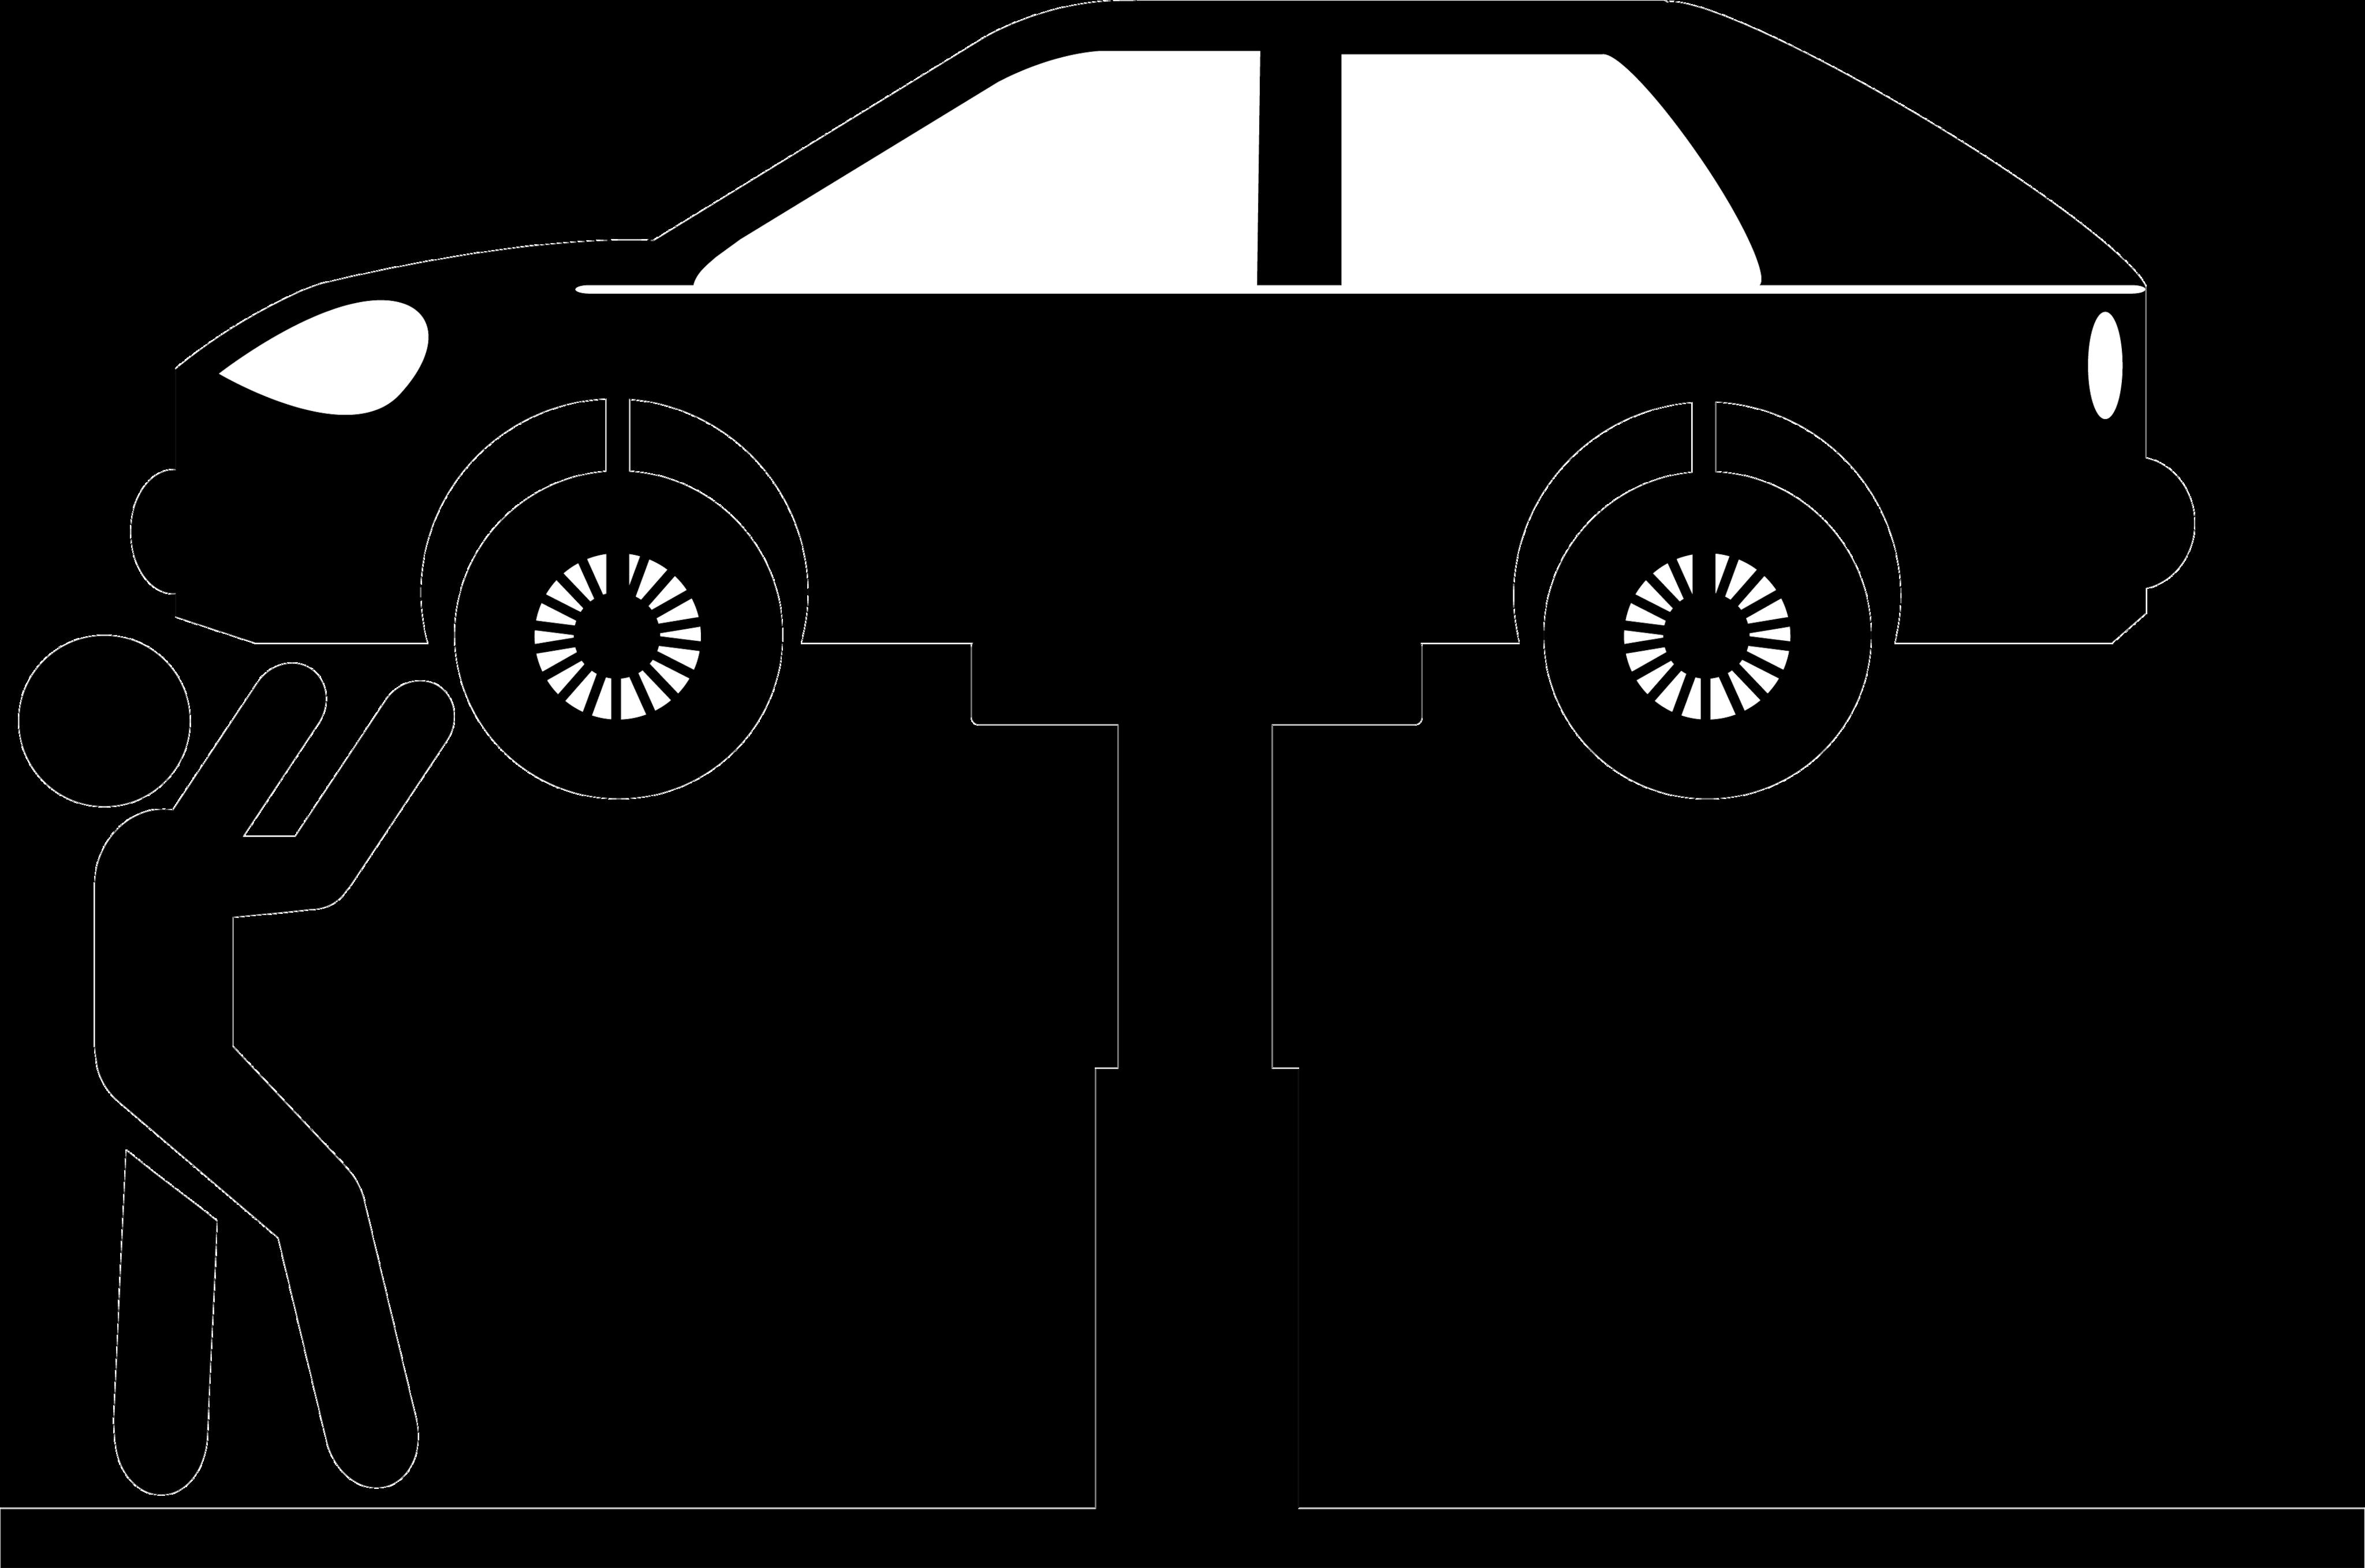 Chevrolet Tire Rotation Diagram Tire Traction Diagram ...